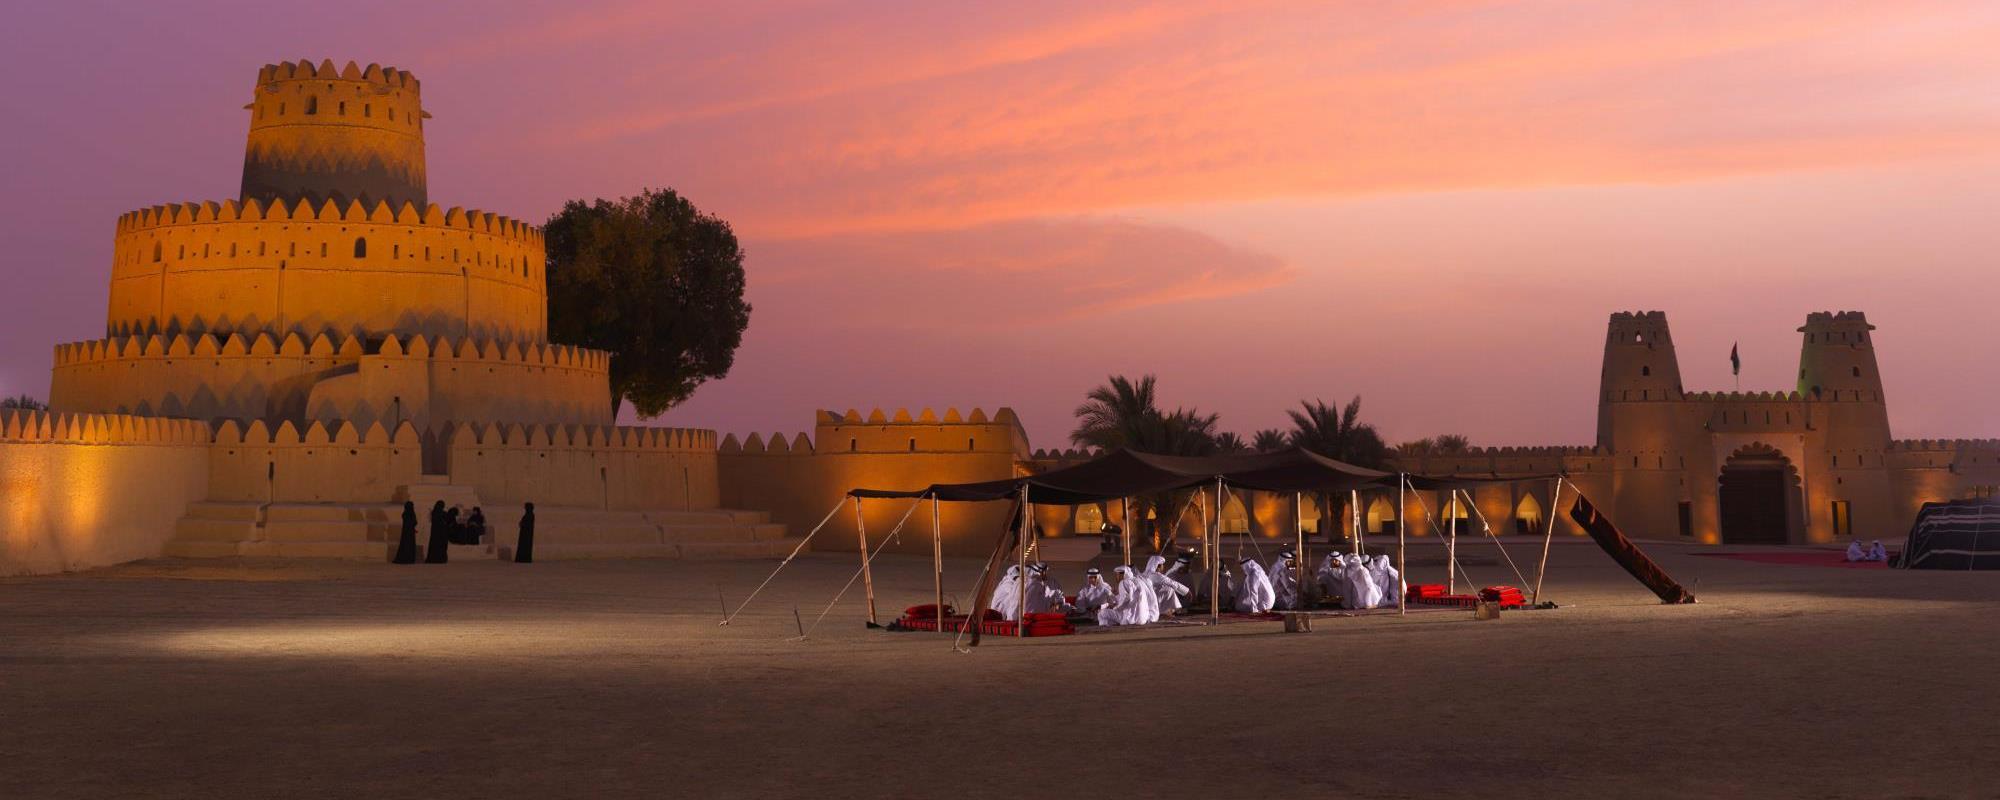 Al Jahili Fort In Al Ain Visitabudhabi Ae